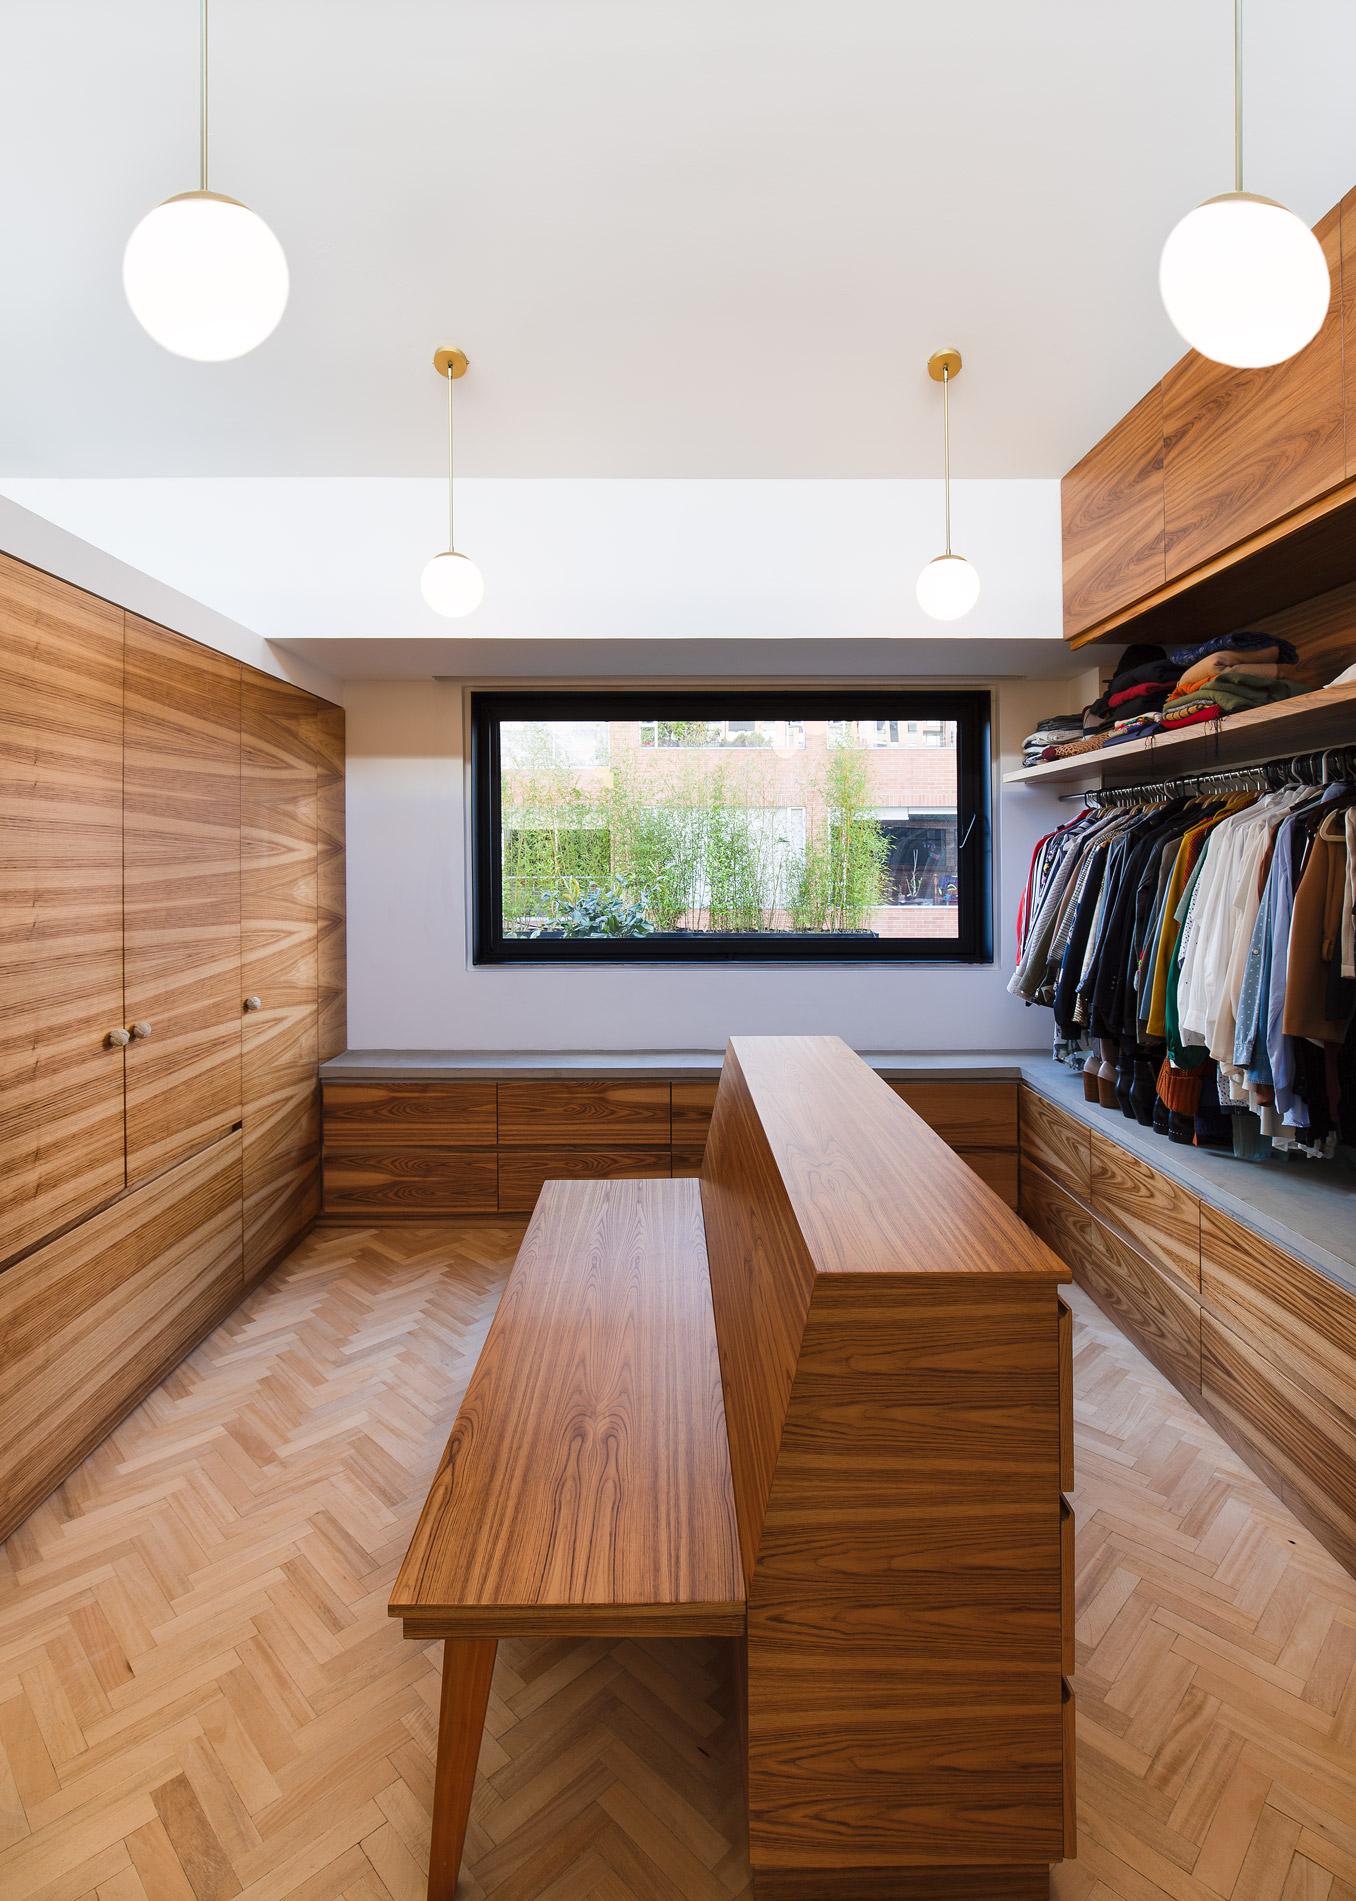 03.oberlaenderarquitectos.arquitectura.simonboschphotography.simon.bosch.bogota.interior.habitar